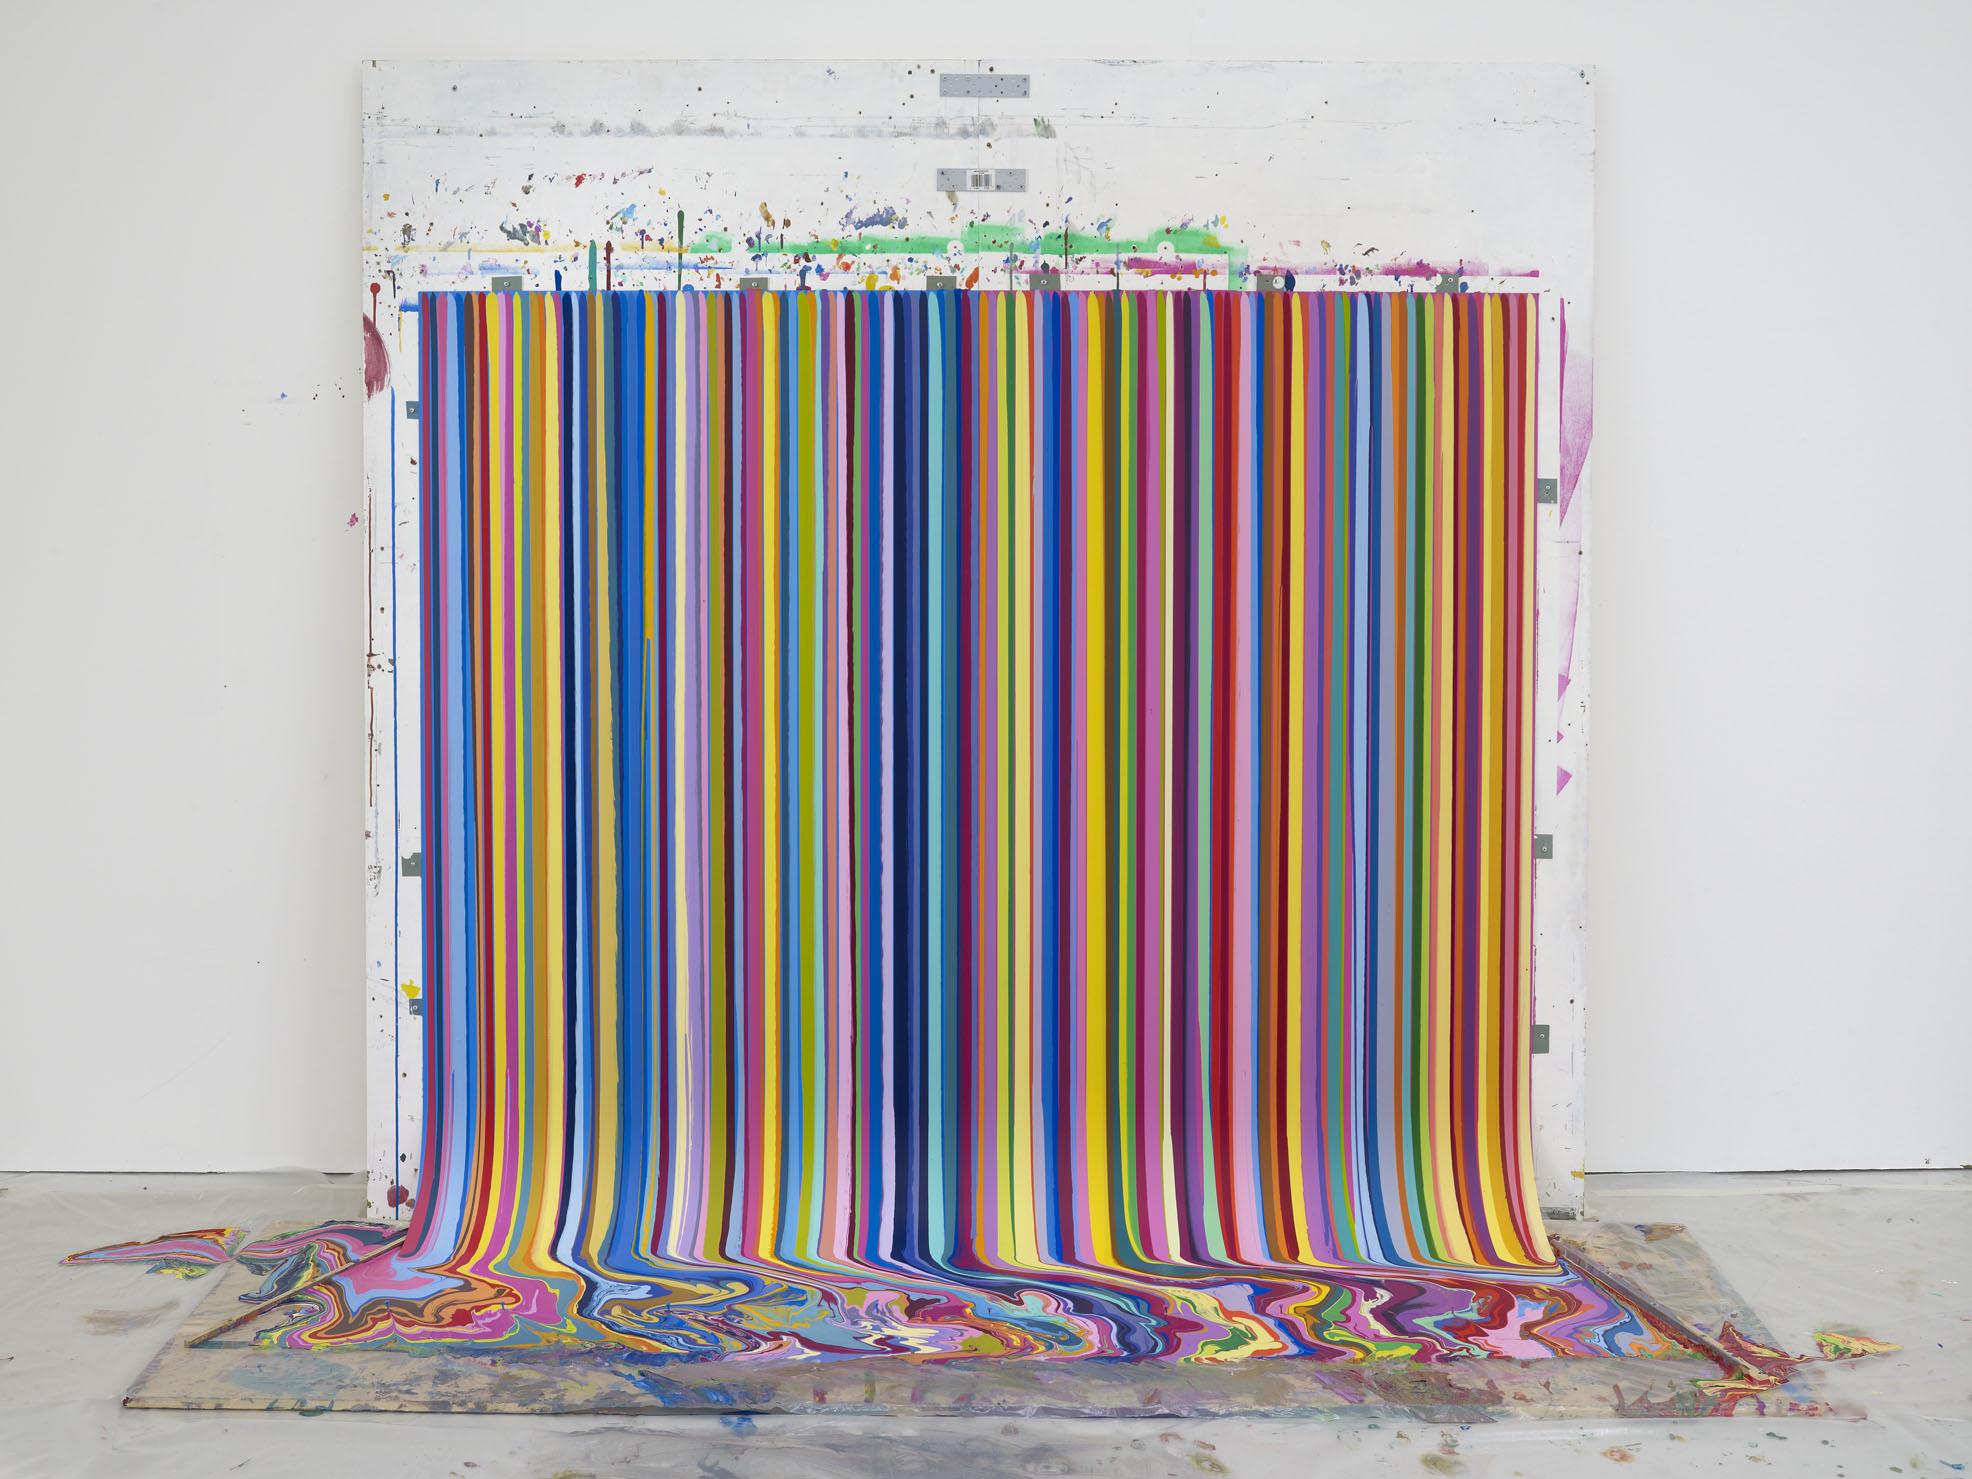 Exhibition installation , Ian Davenport: Colourscapes , Waddington Custot, London, 2018 © Ian Davenport, 2019. Courtesy the artist and Waddington Custot.